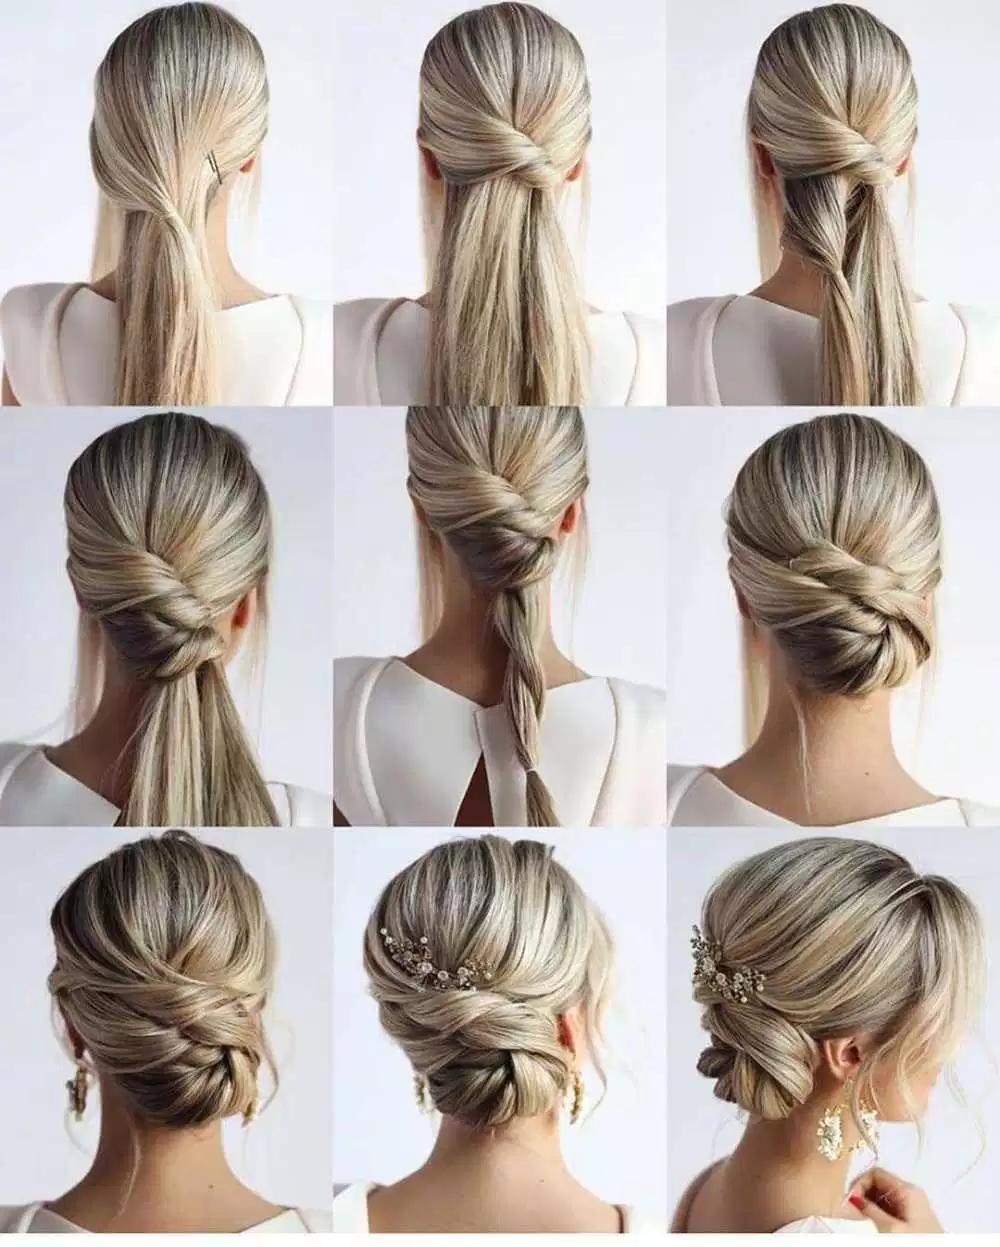 65 women's easy hairstyles step by step diy | easy